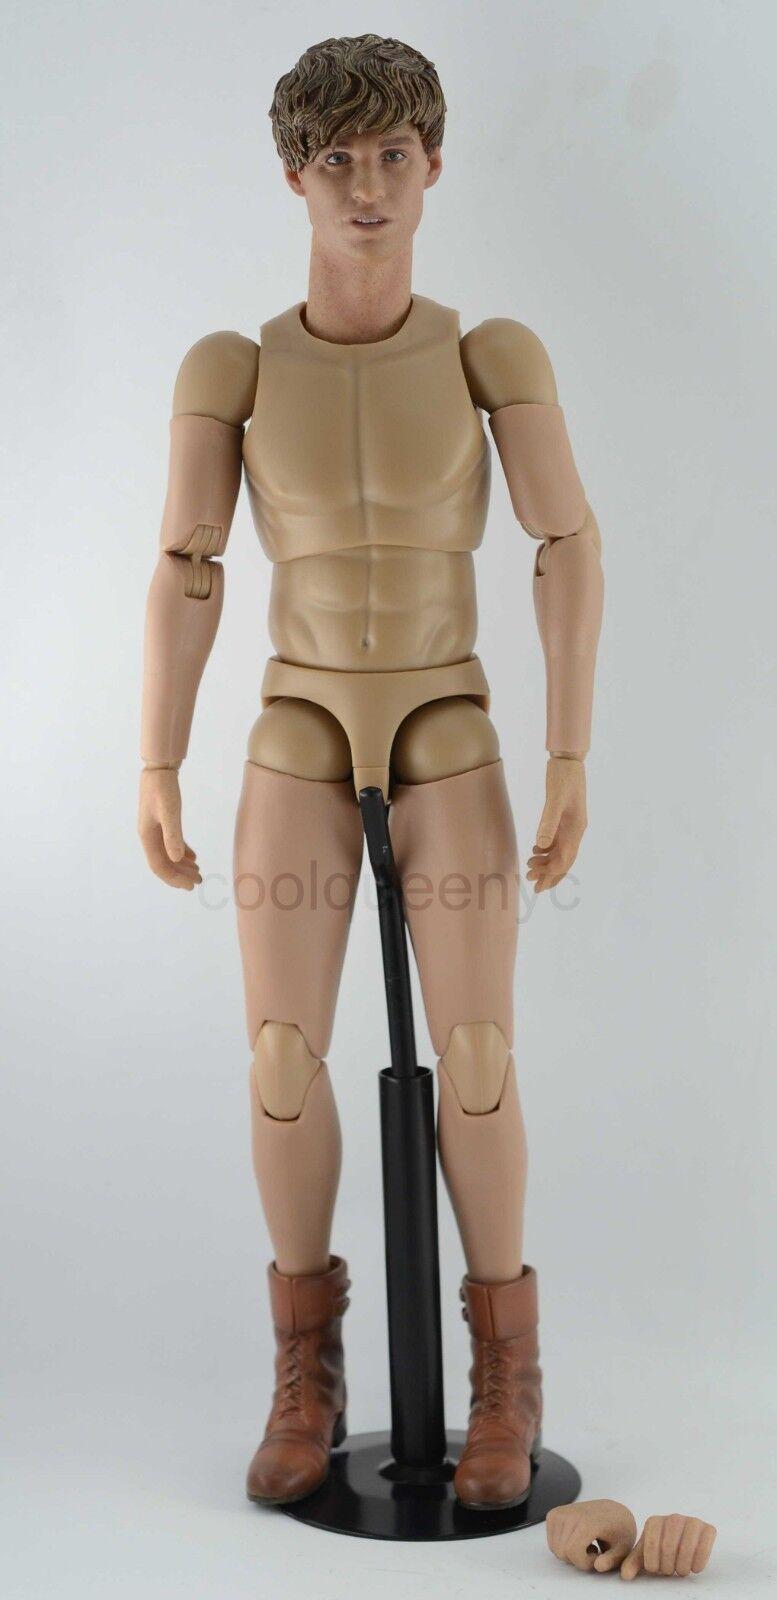 Star Ace Toys 1 6 Scale SA0047 Newt Scamander Figure - Head + Body + Boots